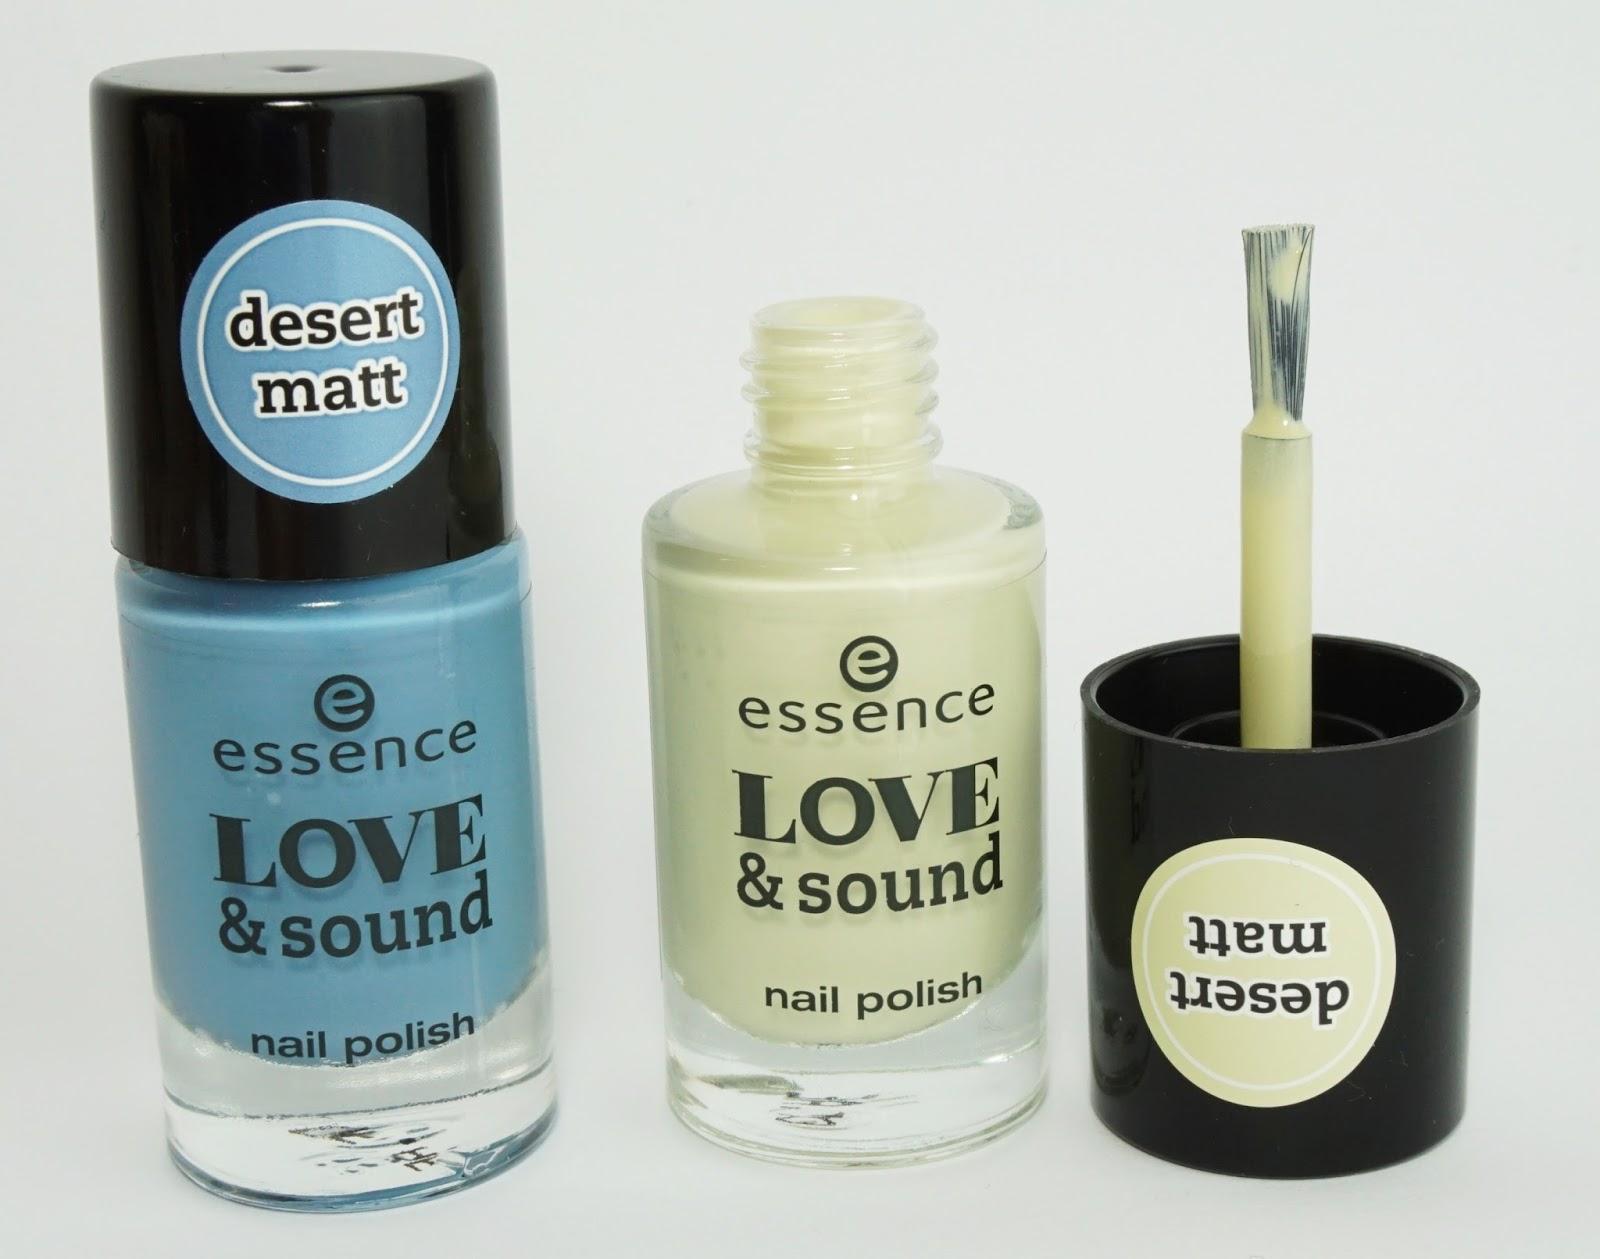 essence - love & sound (Limited Edition April-Mai 2015) nail polish nagellack